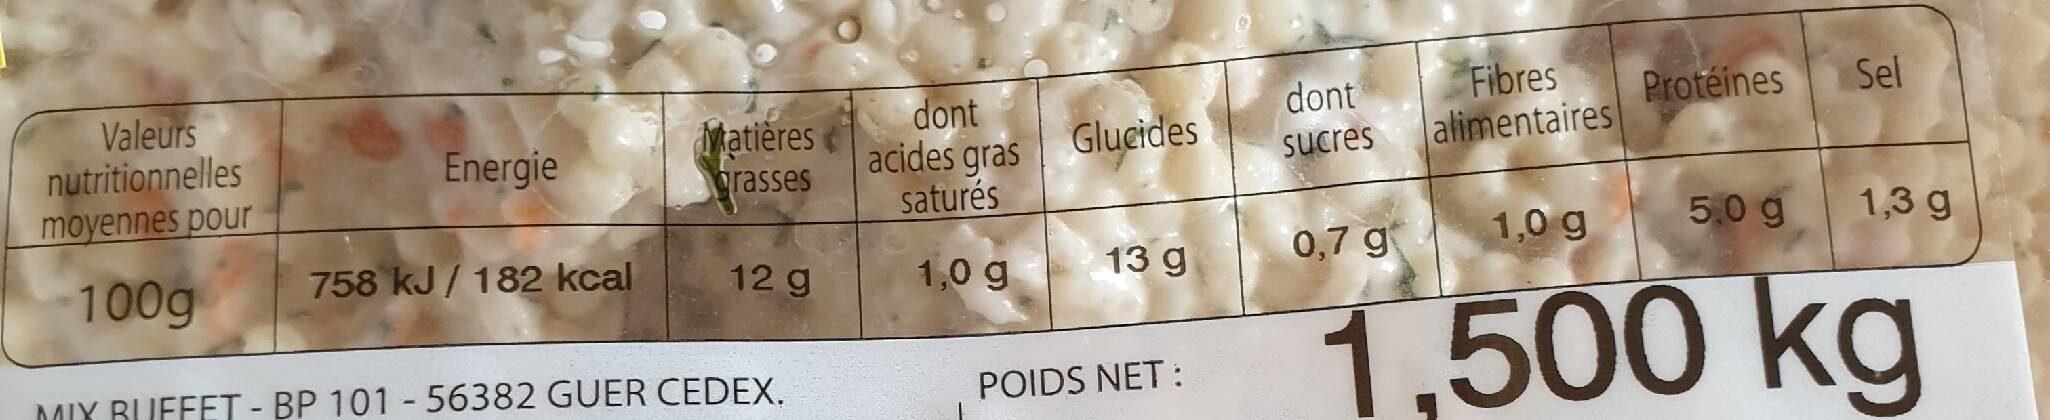 Salade de perles oceane - Nutrition facts - fr